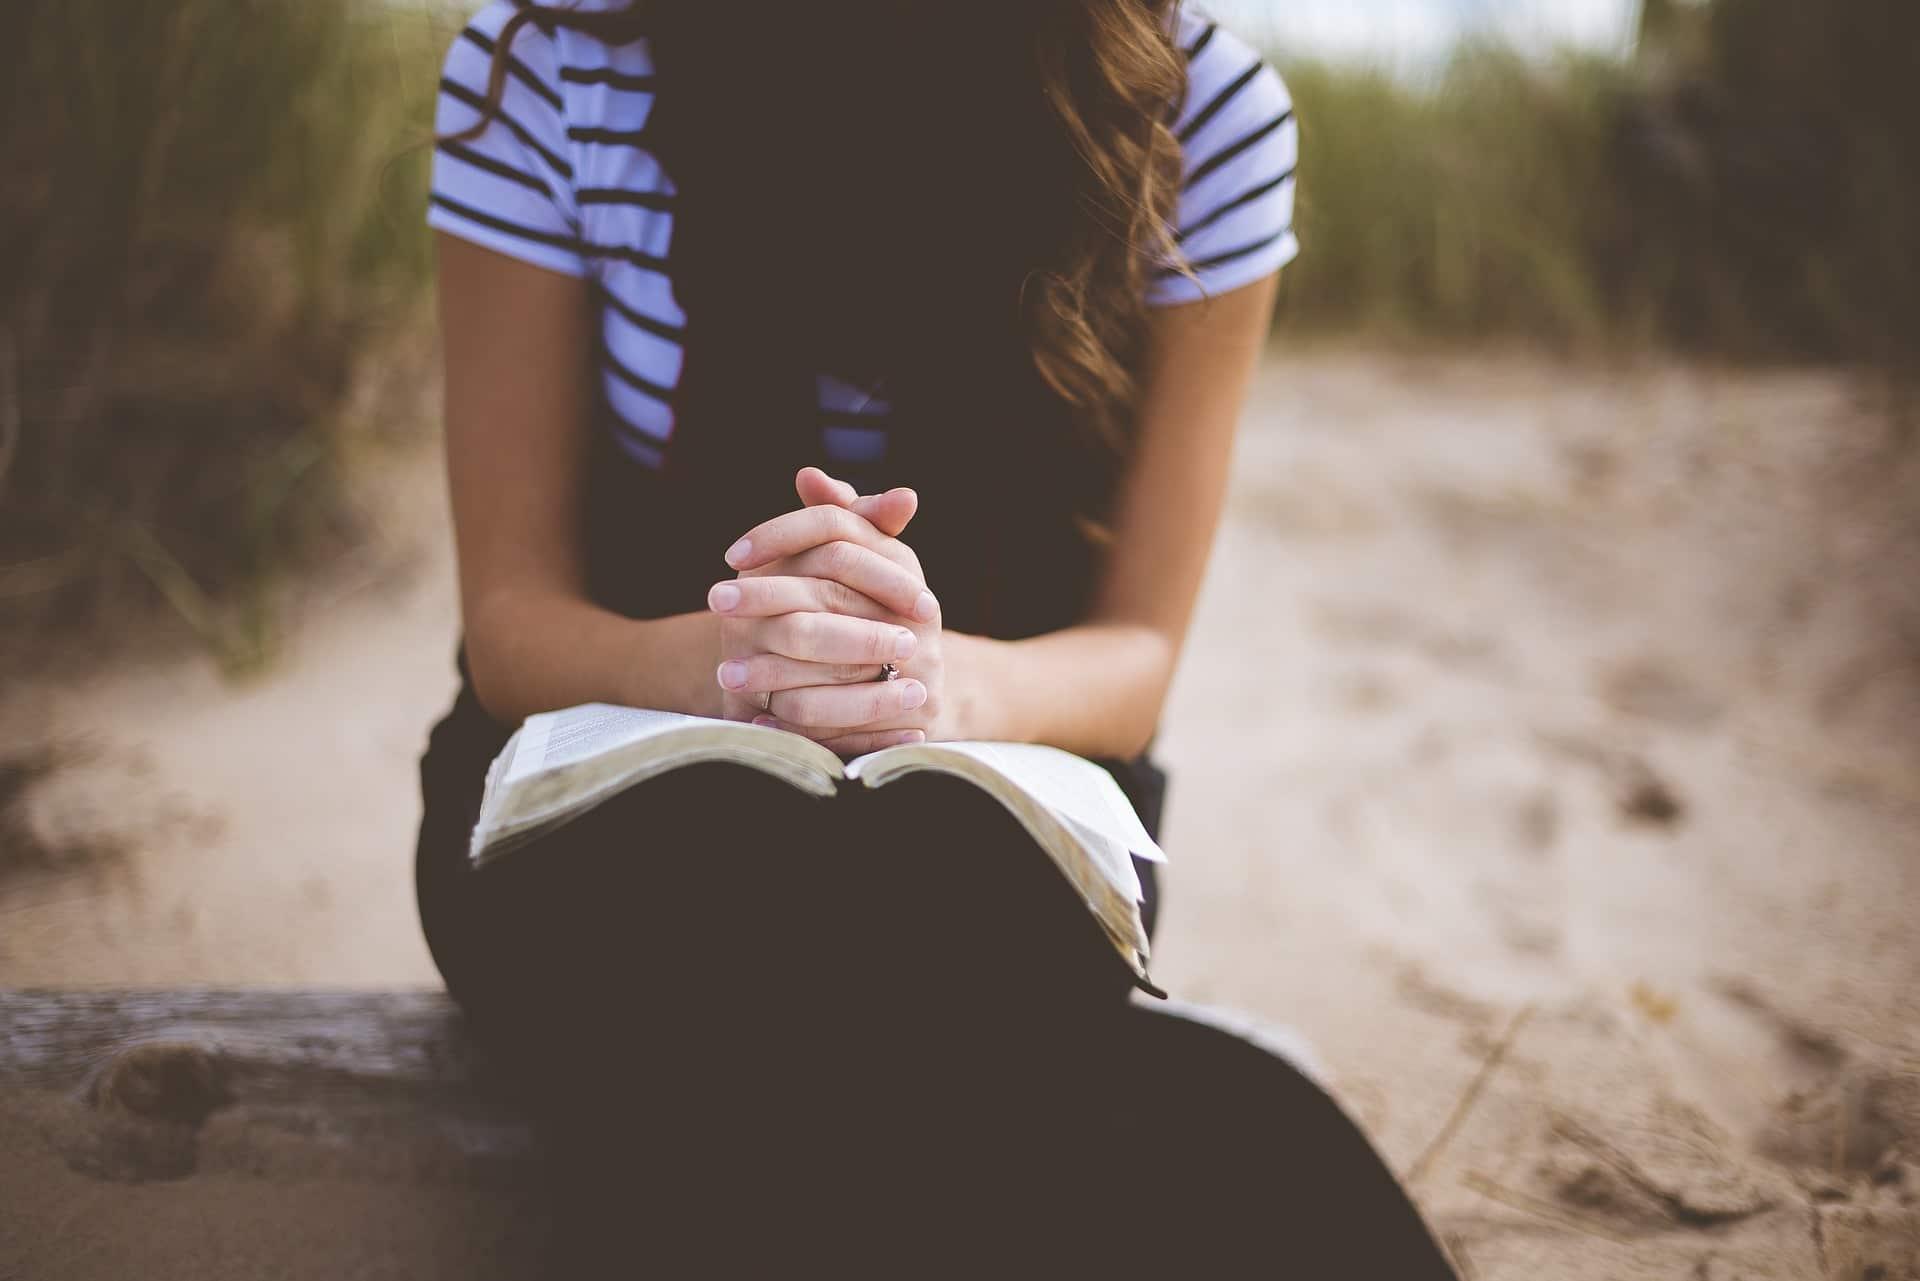 Frau betet am Strand